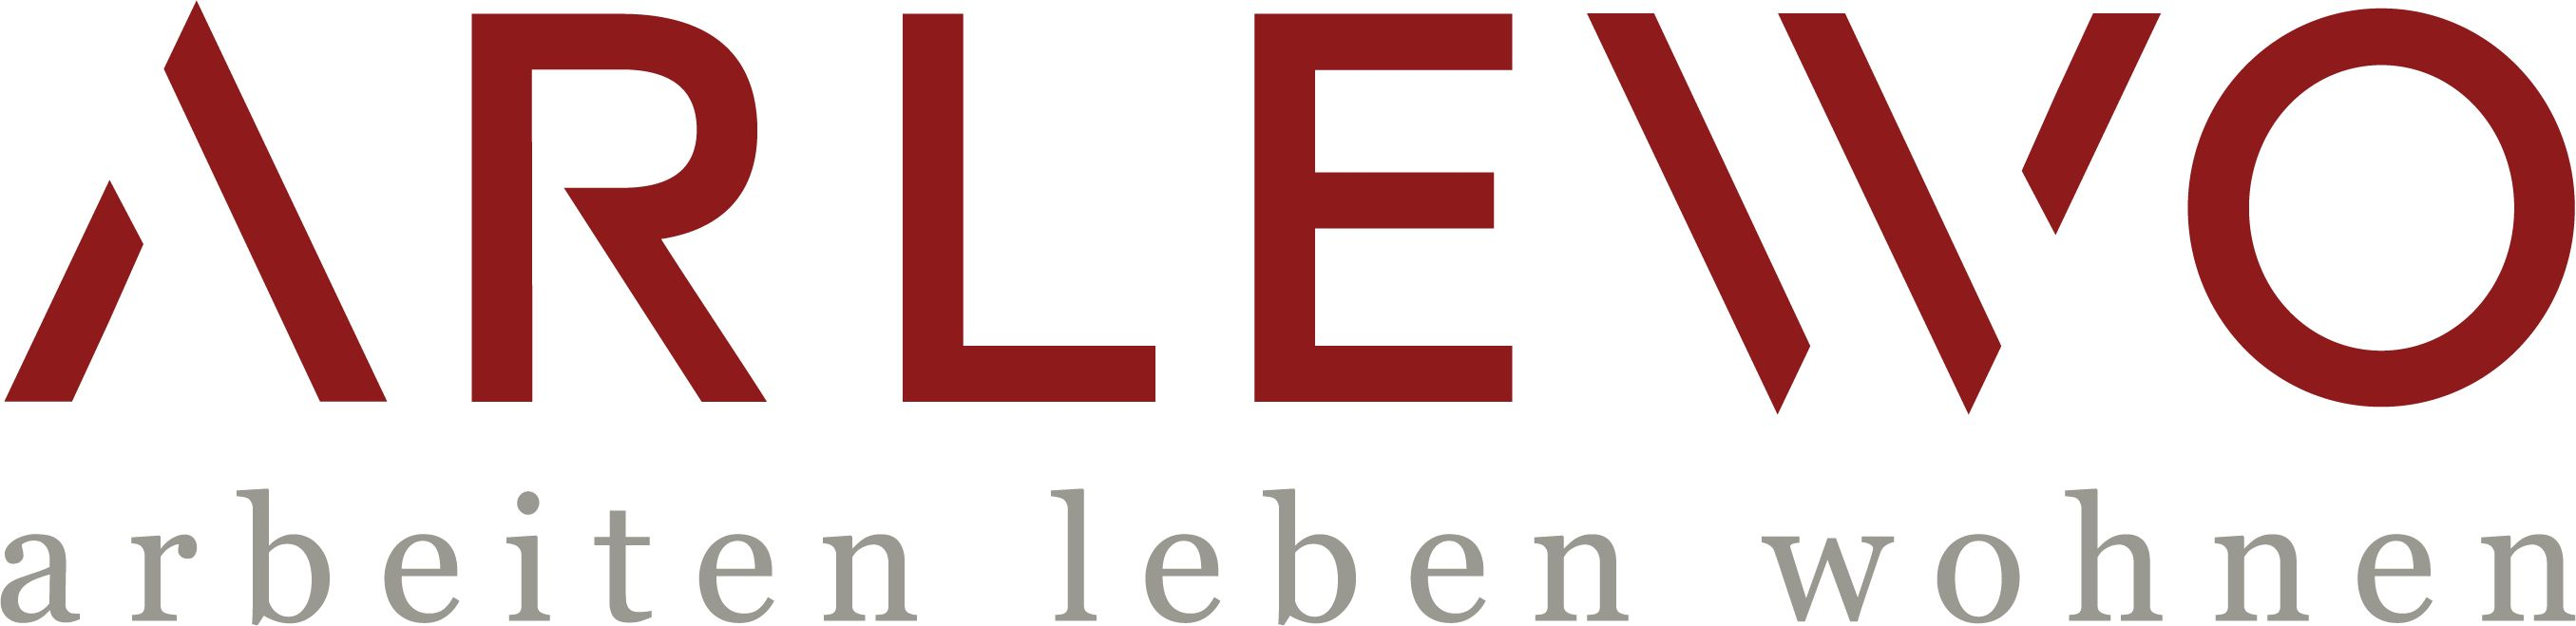 Arlewo AG Logo